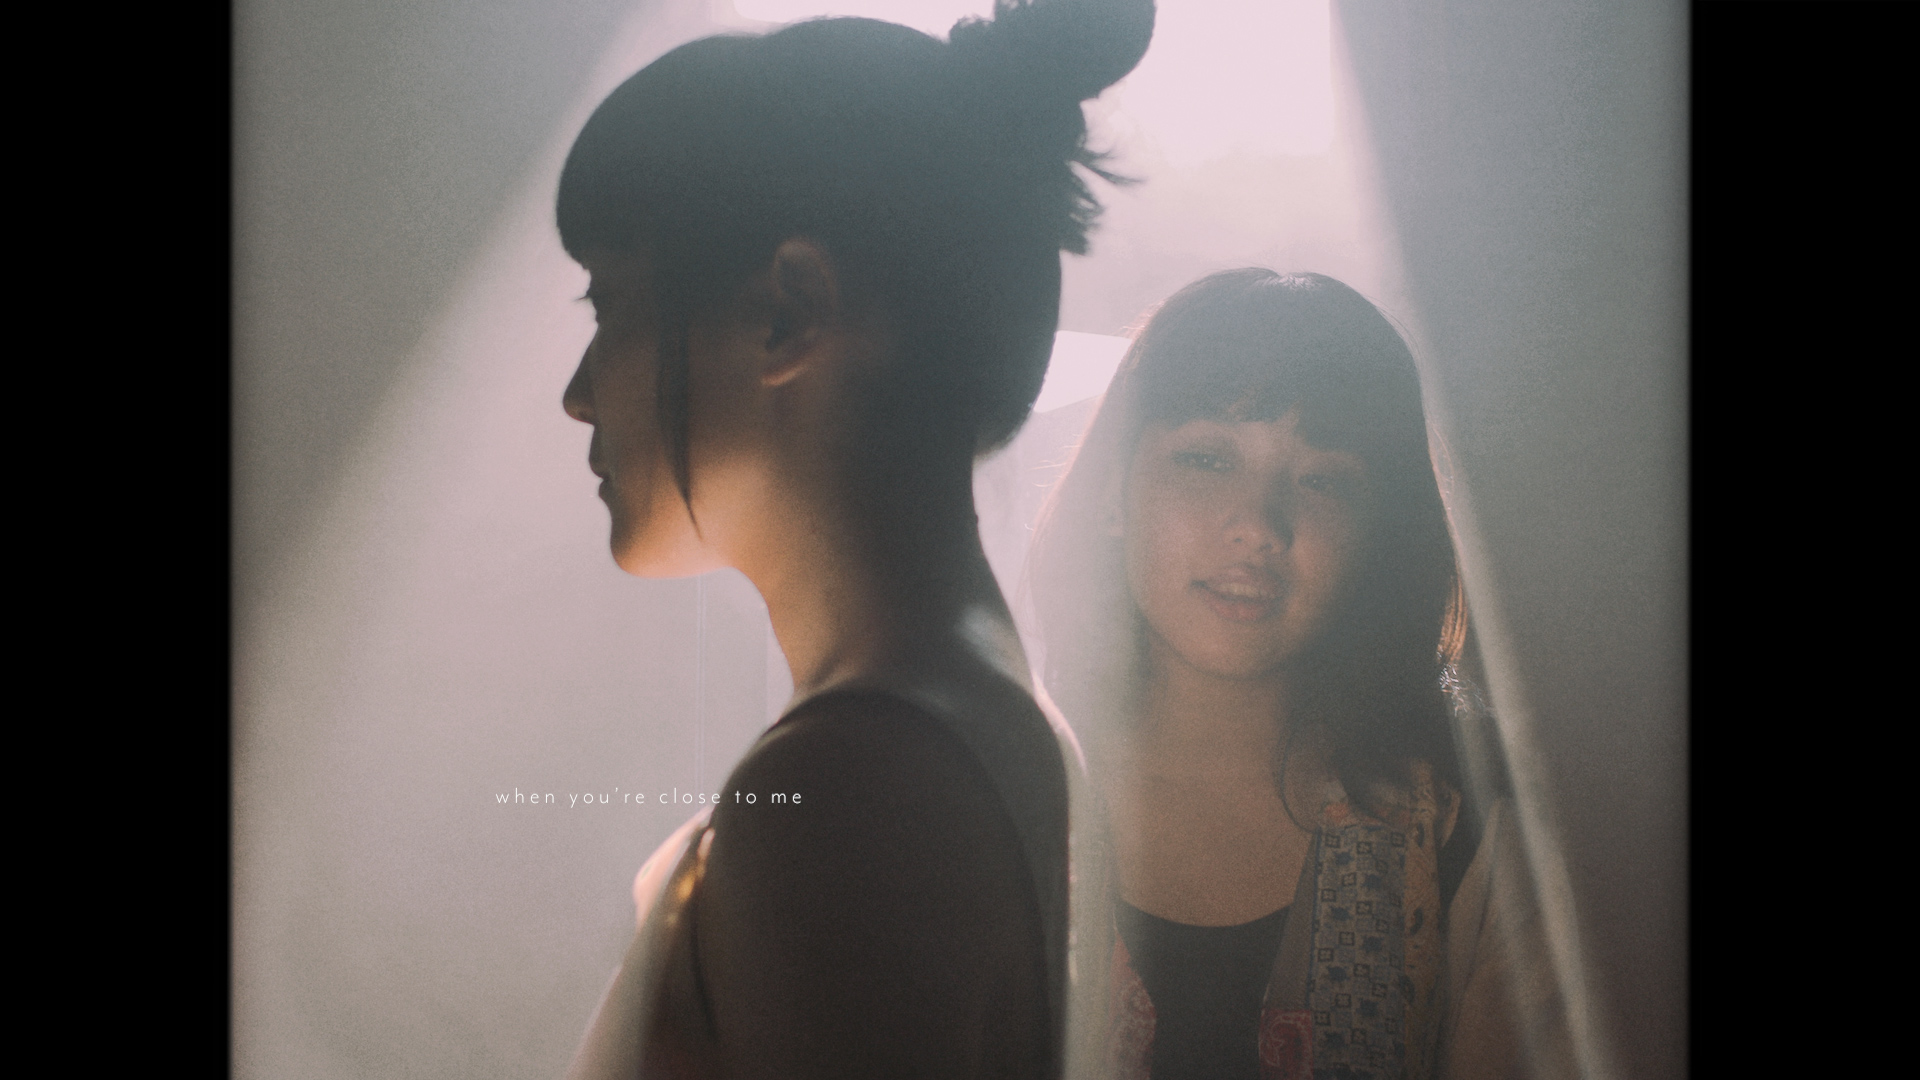 "NABOWA_My Heartbeat (Belong To You)feat. å±±ç""°ãªã¥.mp4.00_01_00_01.Still005.jpg"